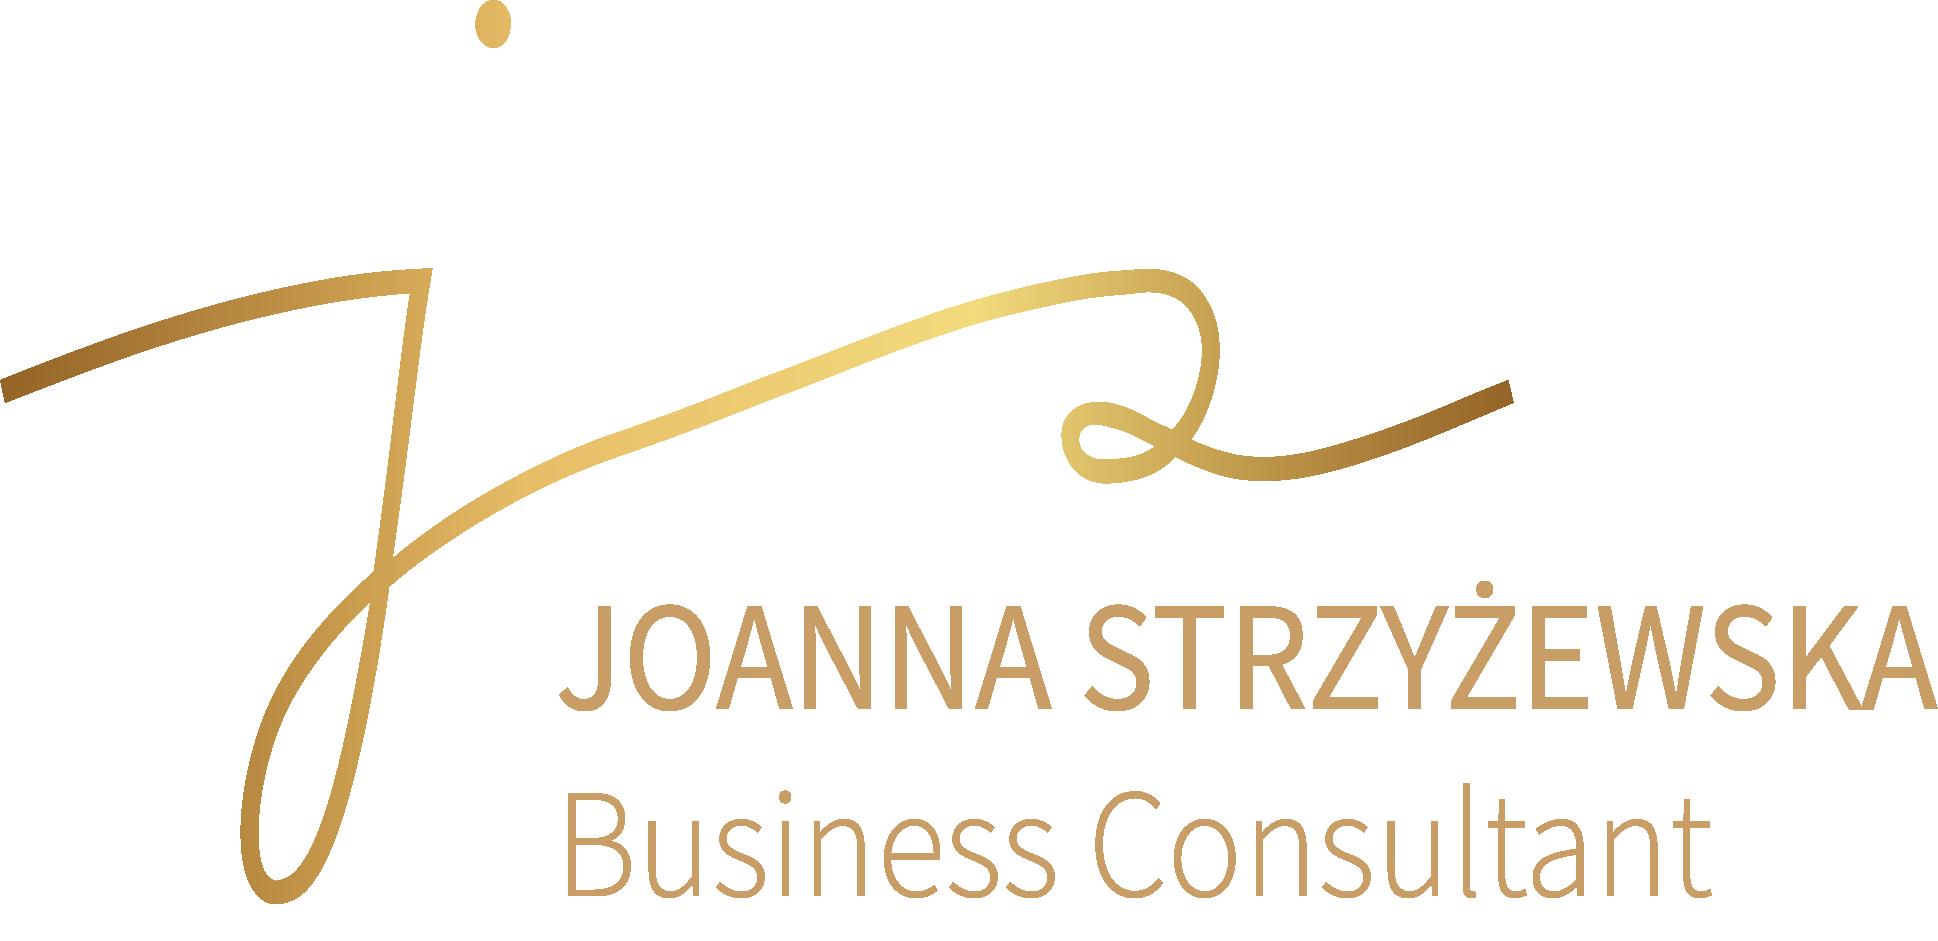 Joanna Strzyżewska